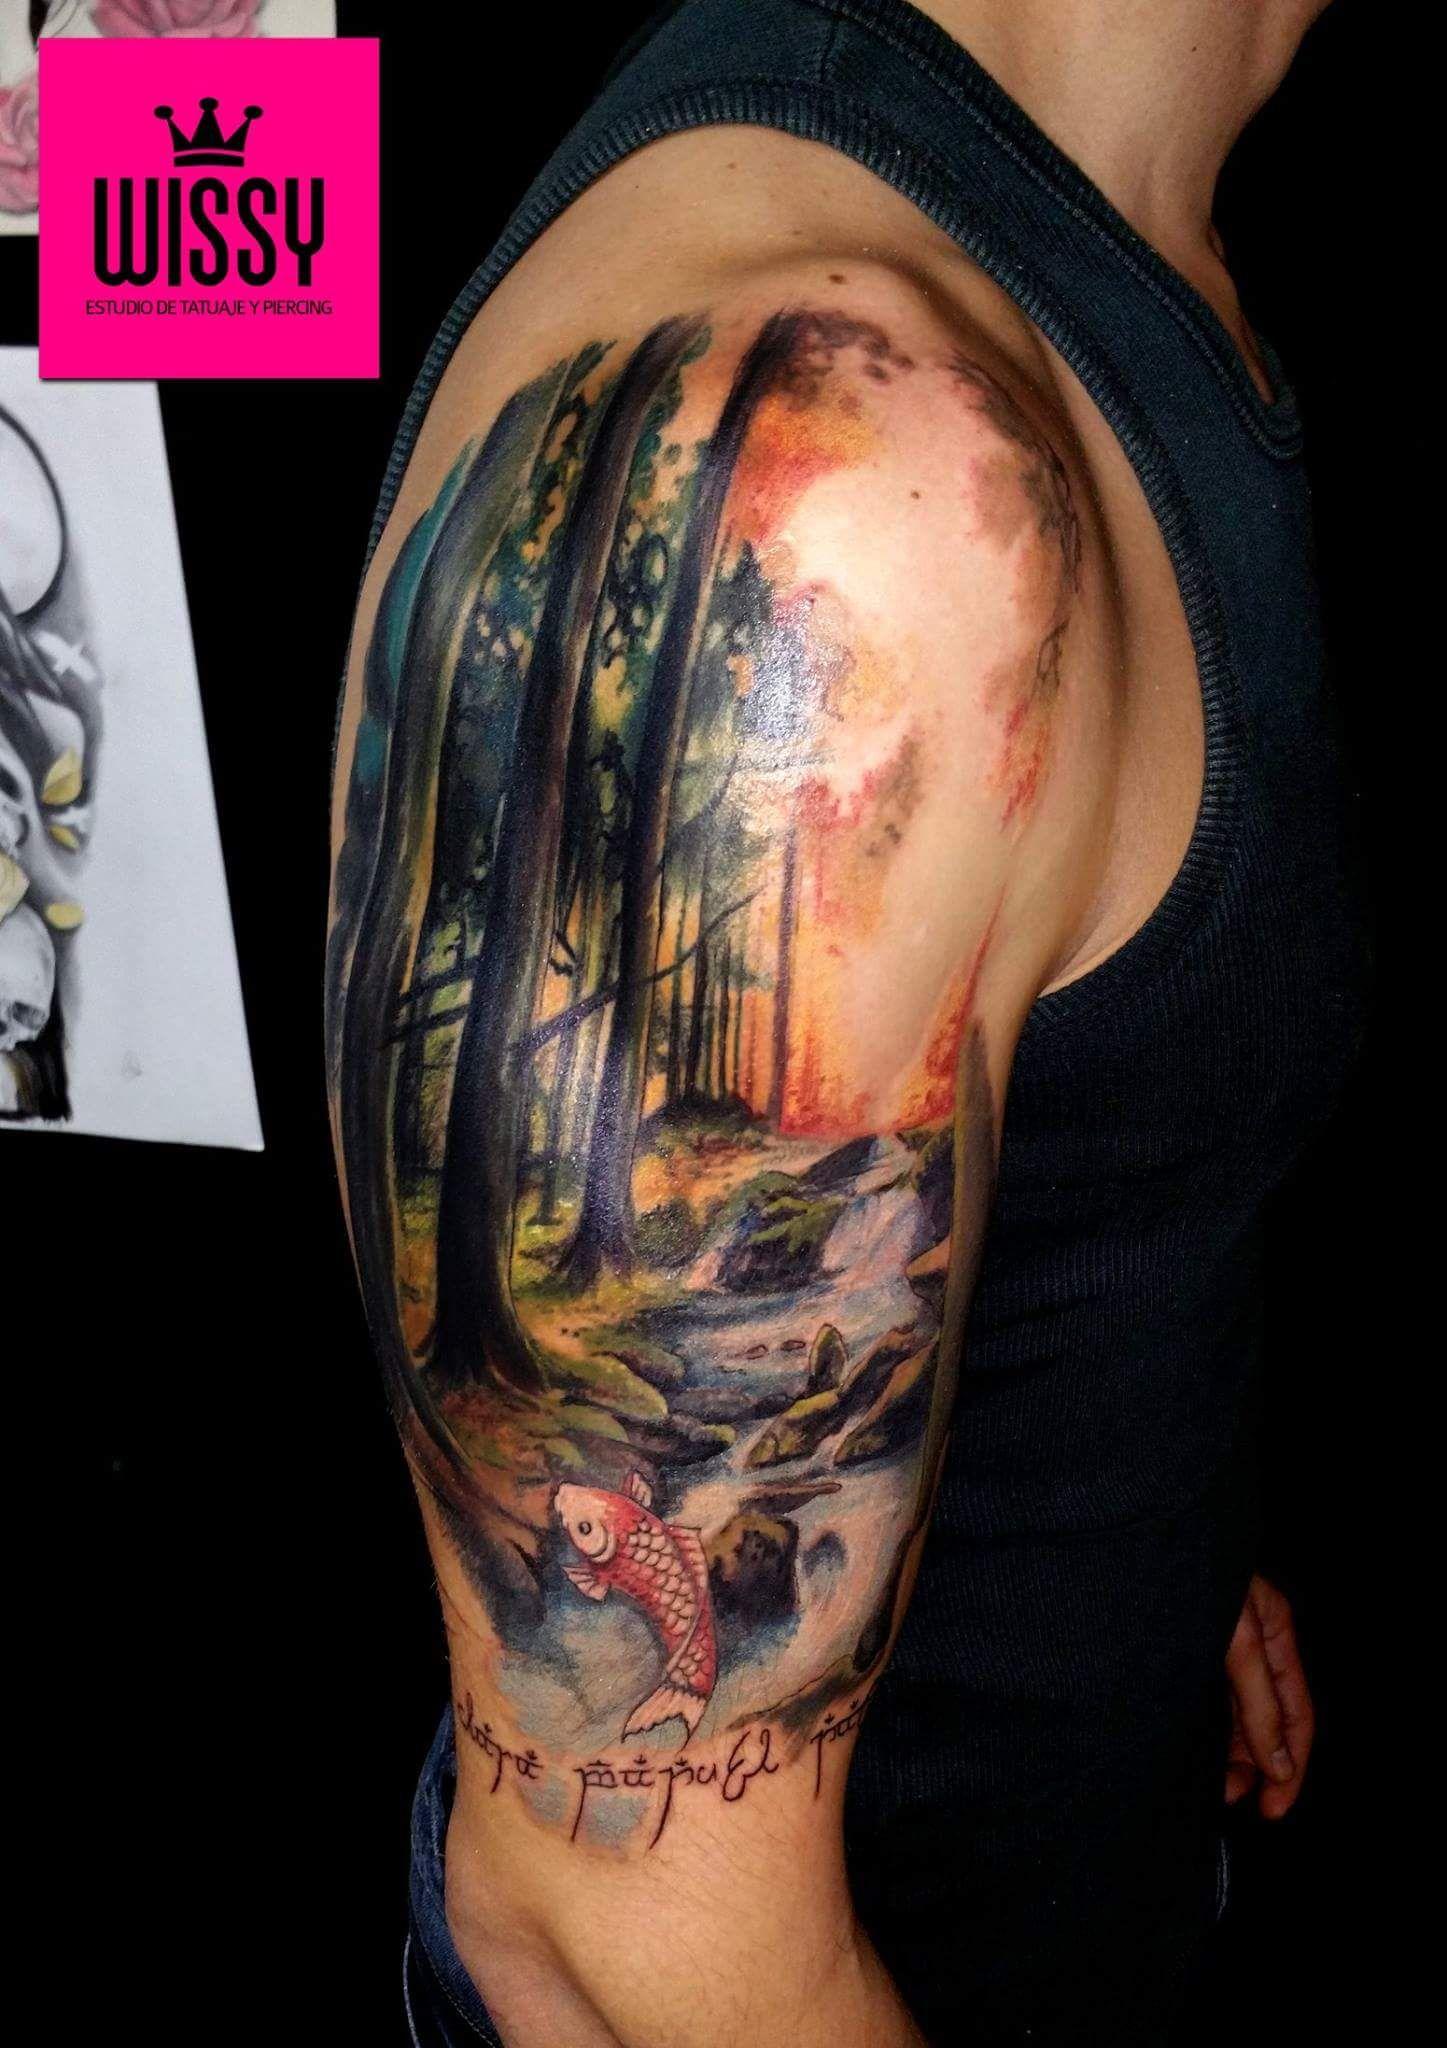 Media manga en proceso wissy tattoo estudio de tatuaje y - Mangas de tattoo ...